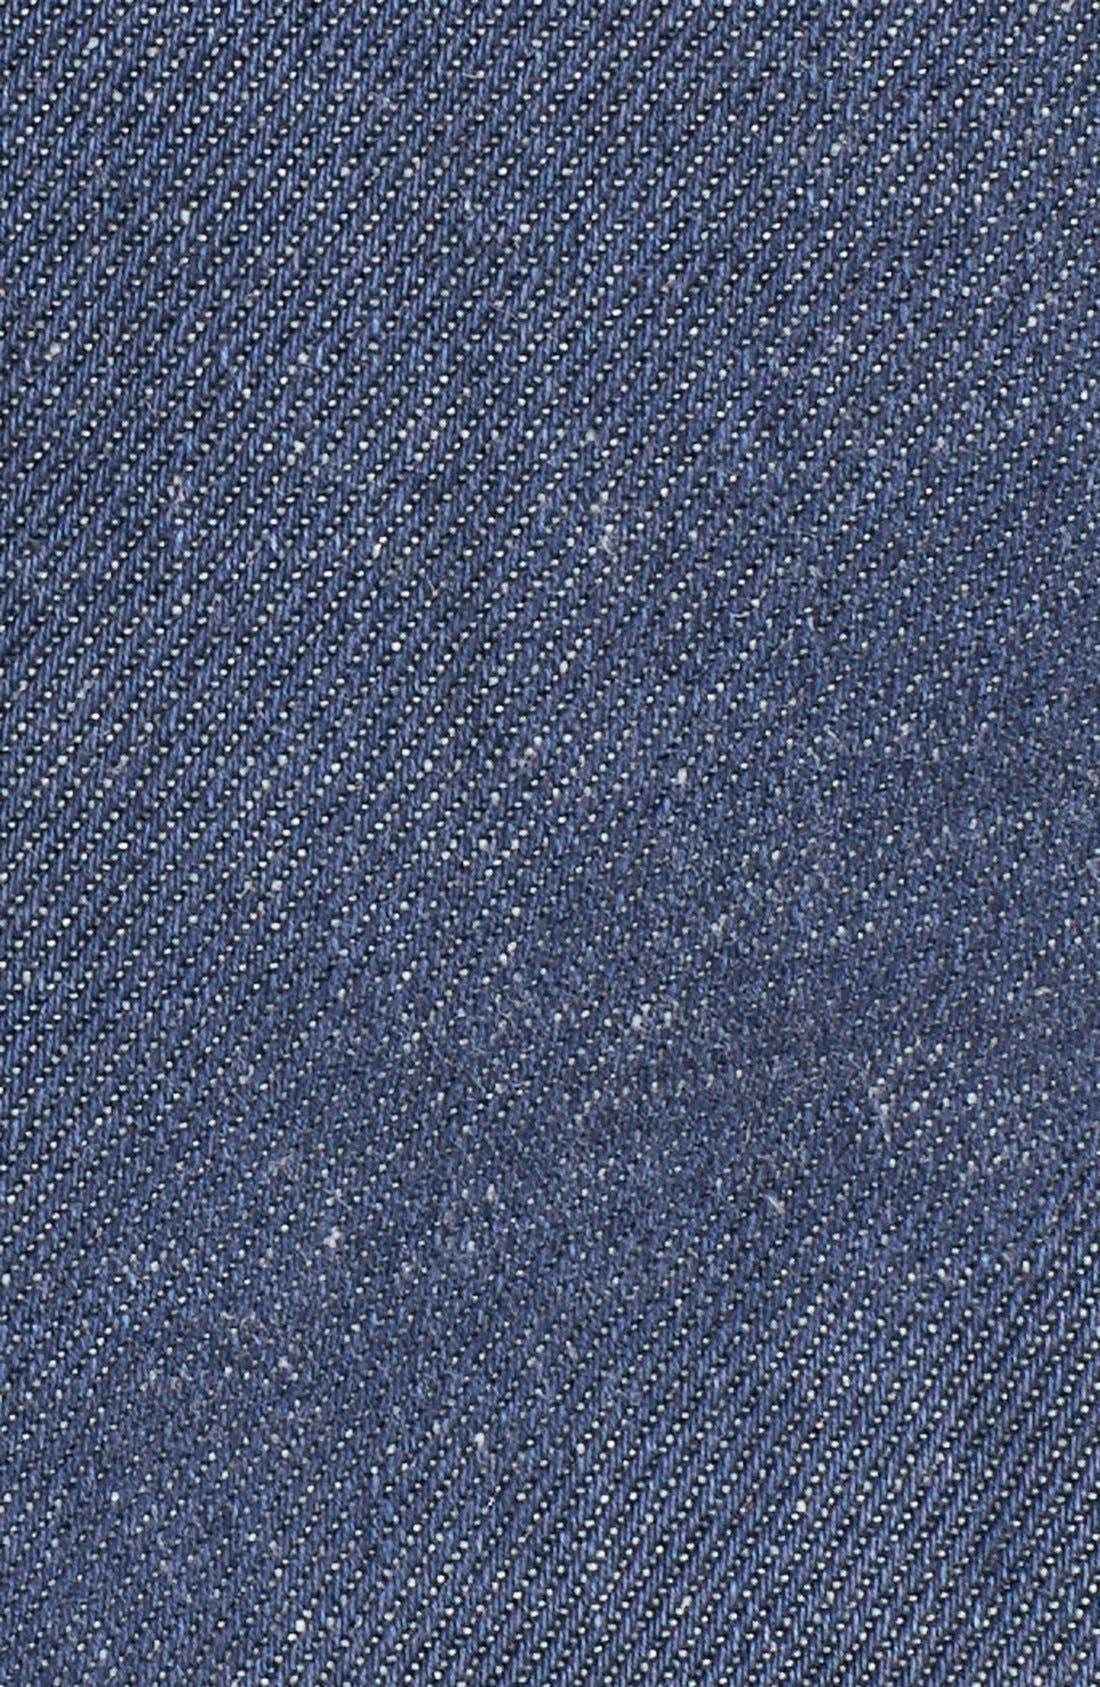 Quilted Denim Jacket,                             Alternate thumbnail 2, color,                             407